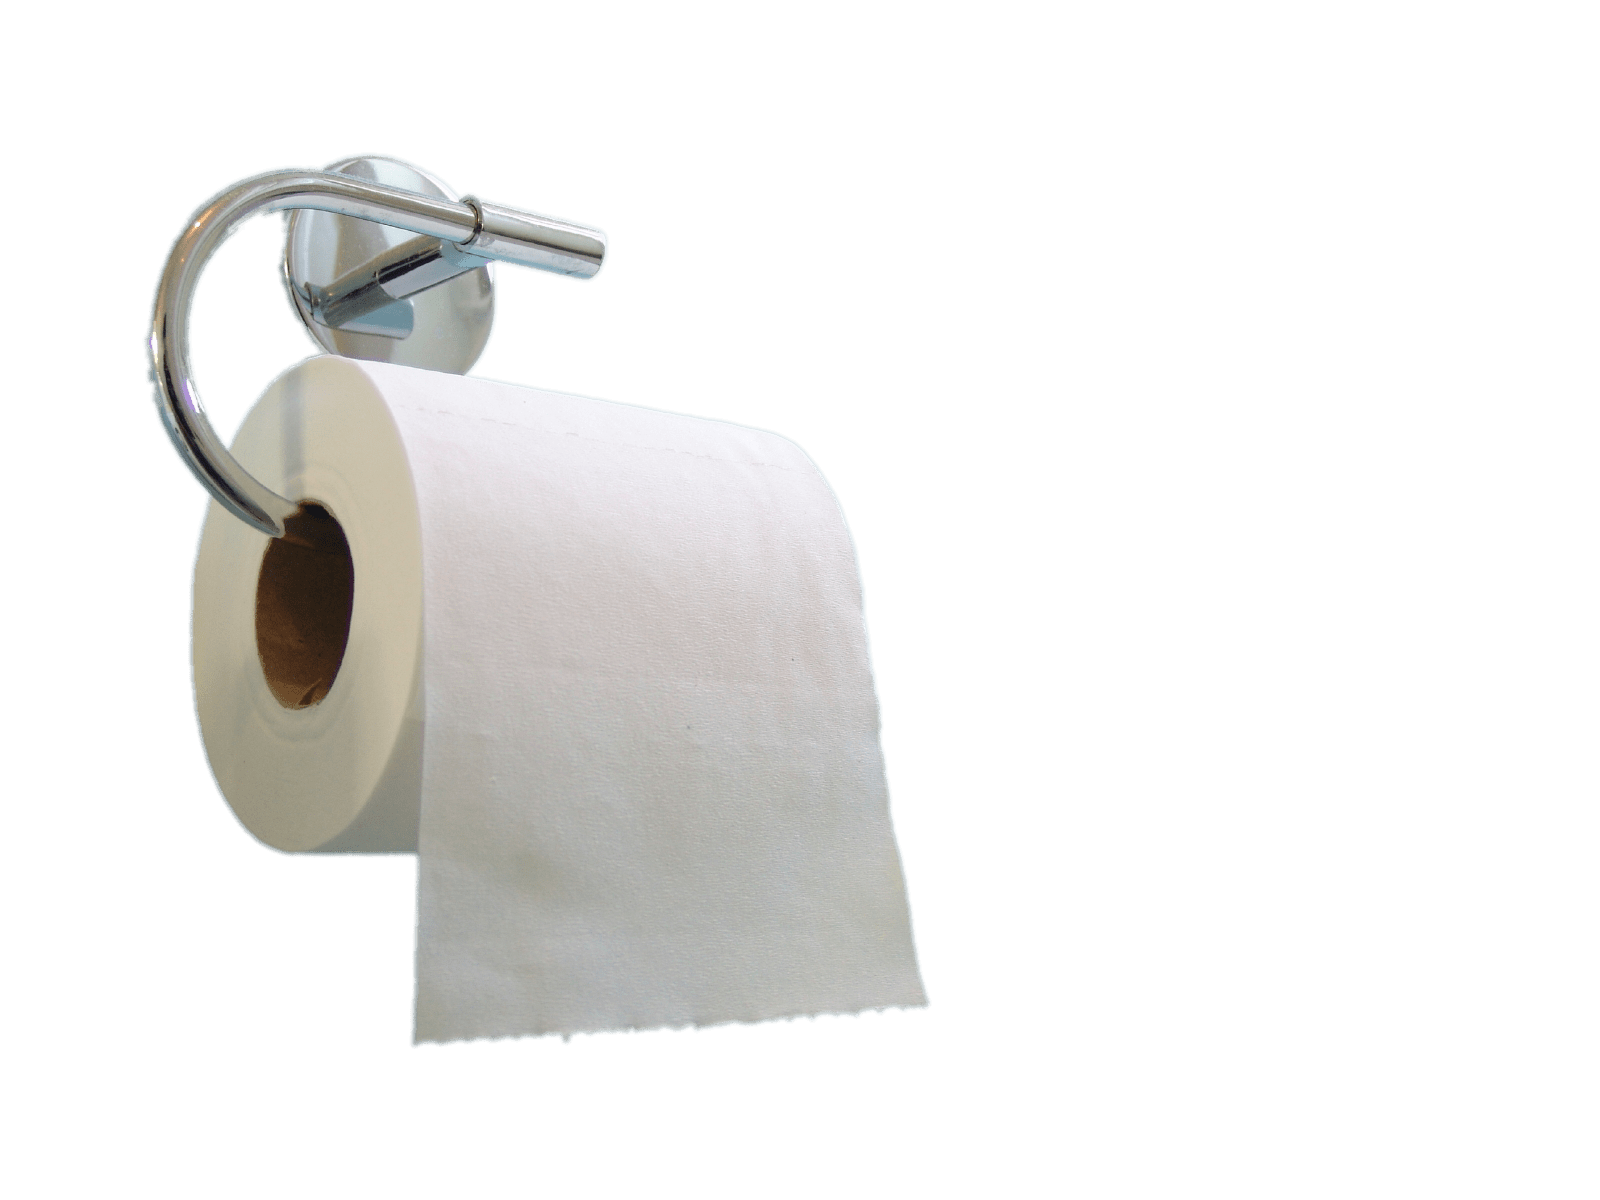 Clipart toilet toilet paper. Roll empty transparent png